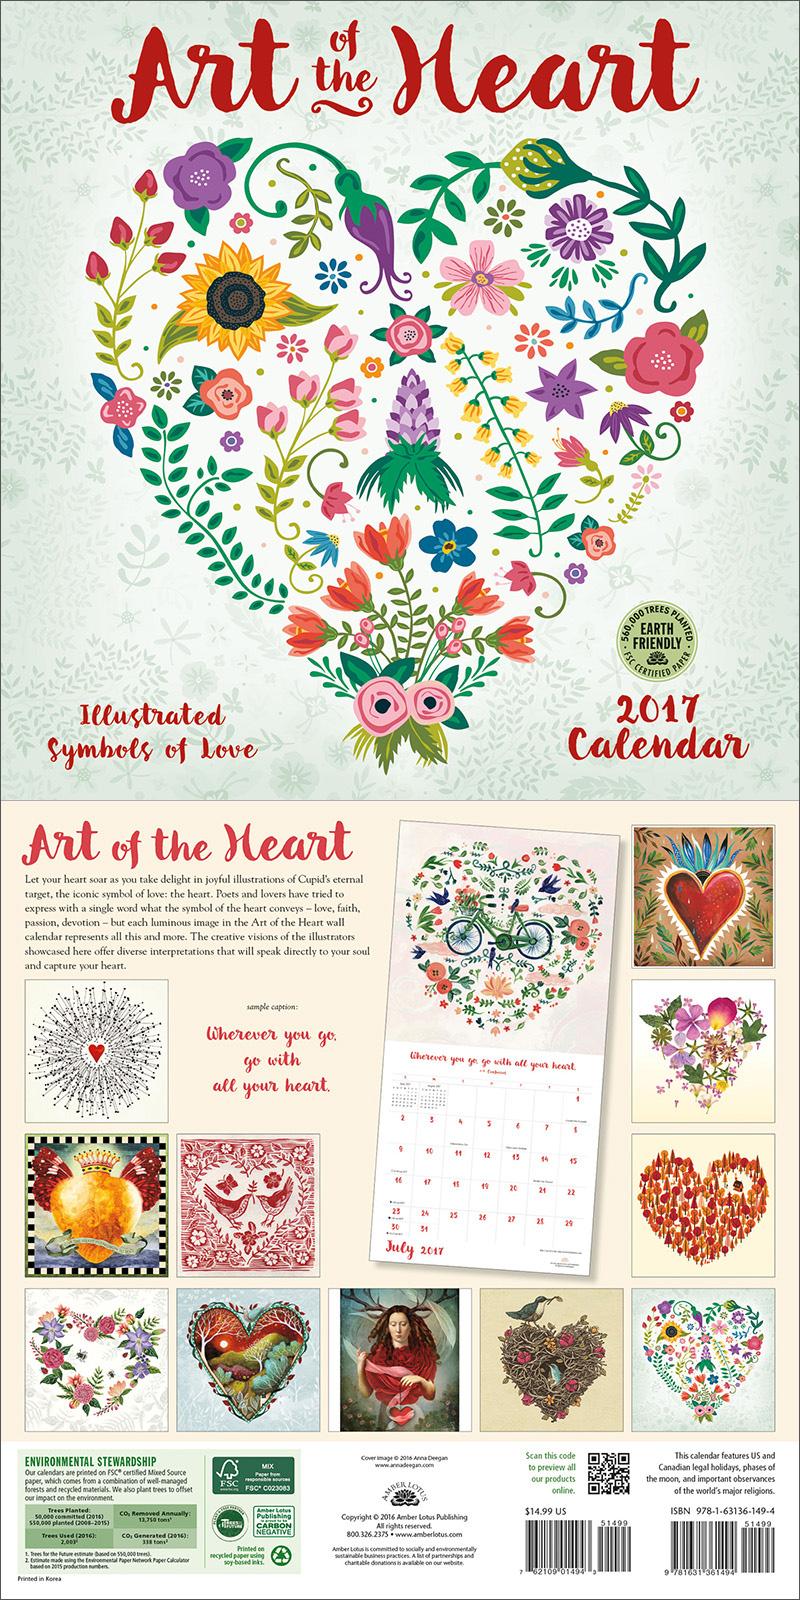 New Calendar Art Of The Heart Illustrated Symbols Of Love